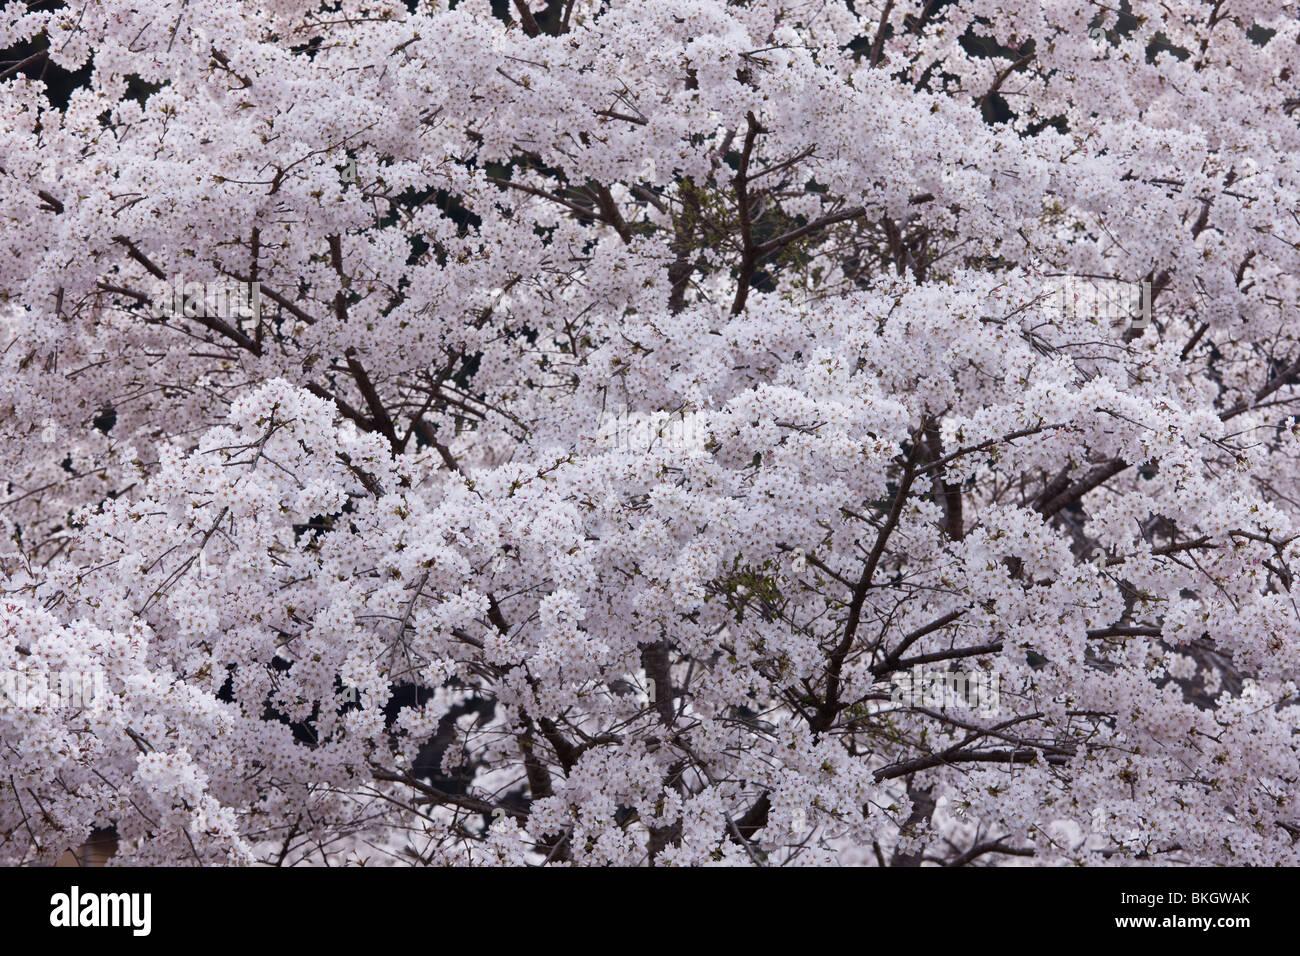 Cherry blossoms full-bloomed Stock Photo